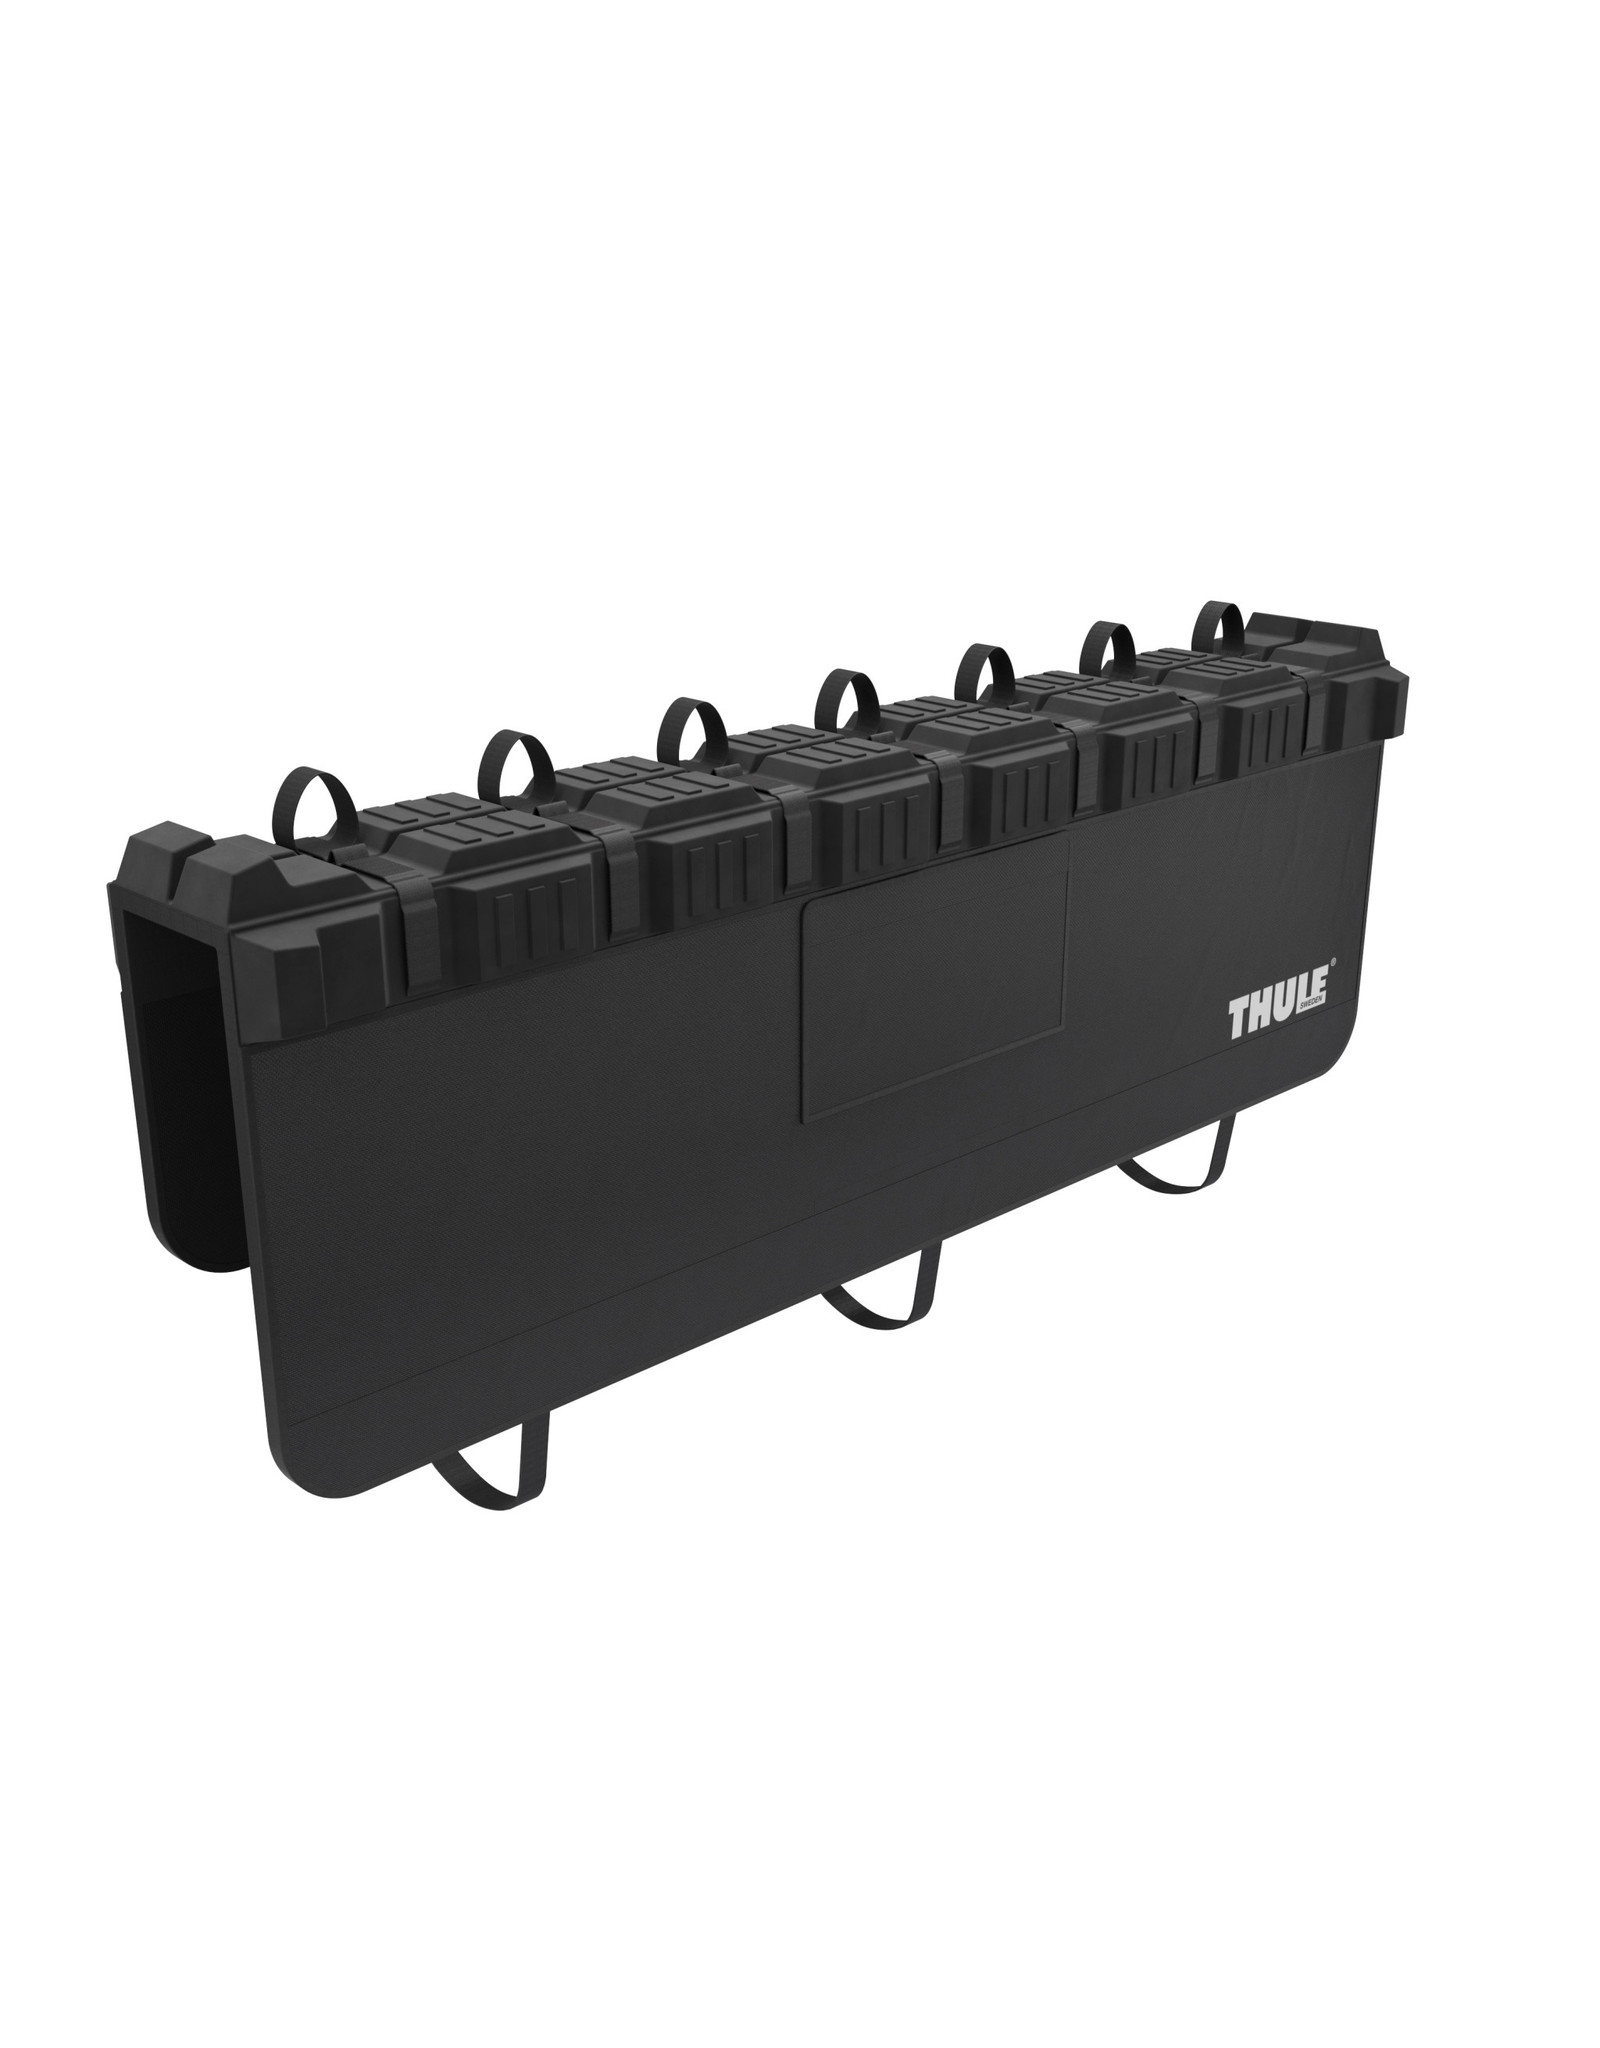 THULE GateMate Pro Full-Size Black/Silver